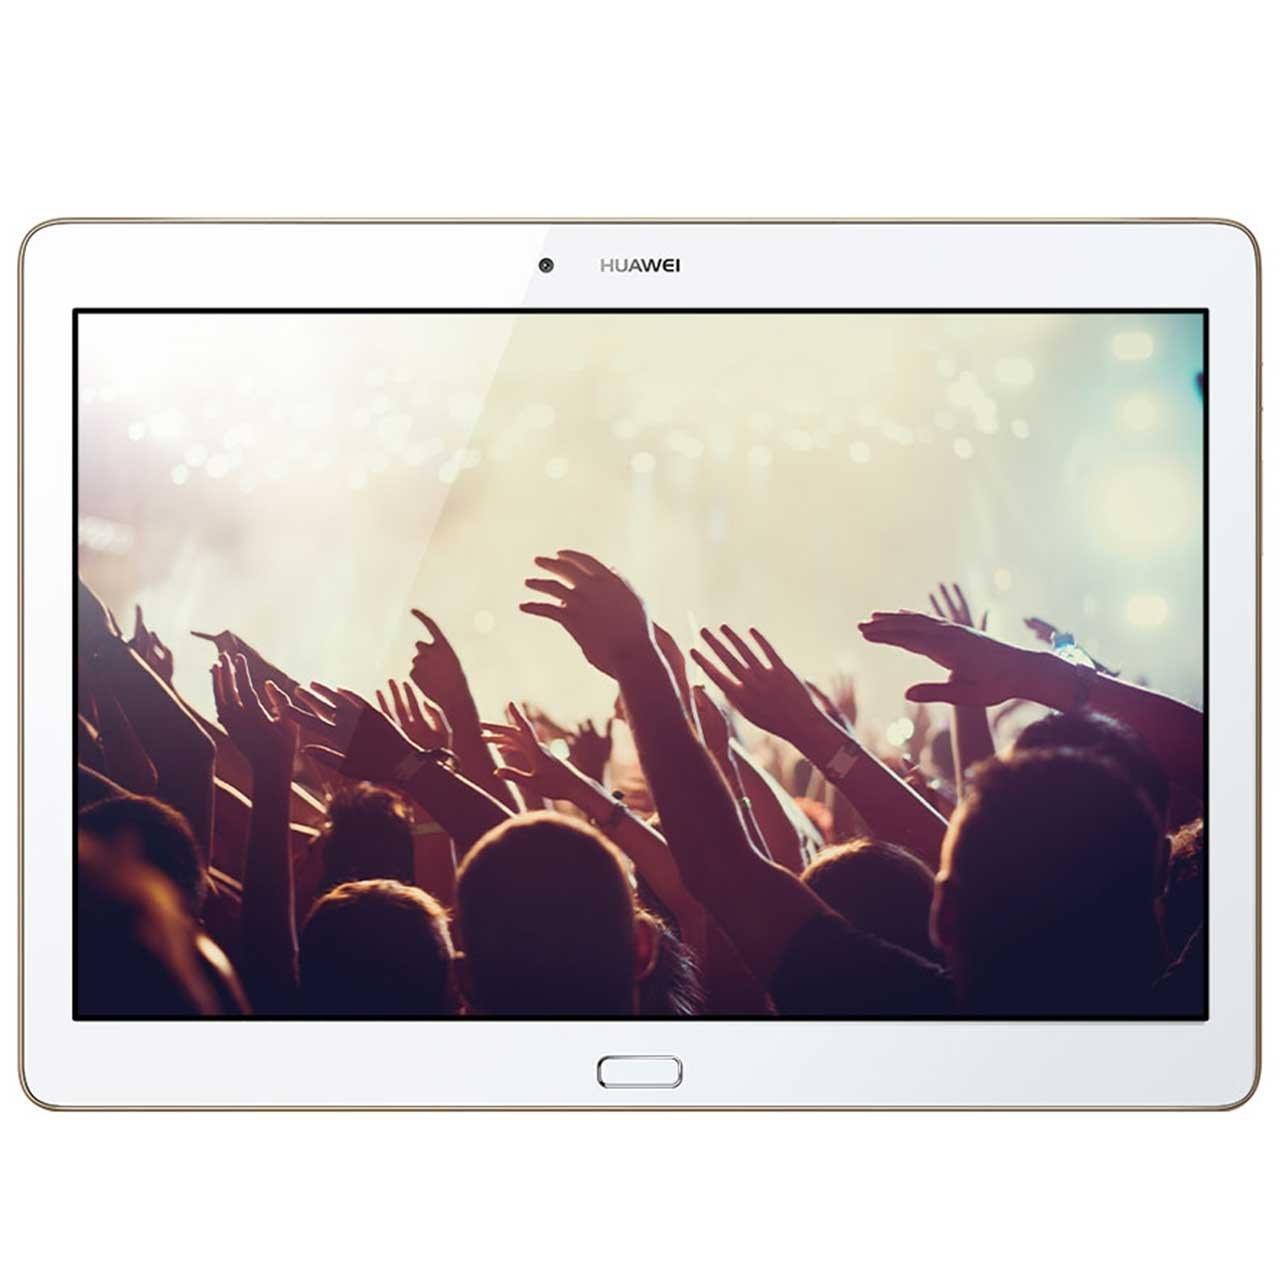 تبلت هوآوي مدل Mediapad M2 10.0 ظرفيت 16 گيگابايت | Huawei Mediapad M2 10.0 16GB Tablet